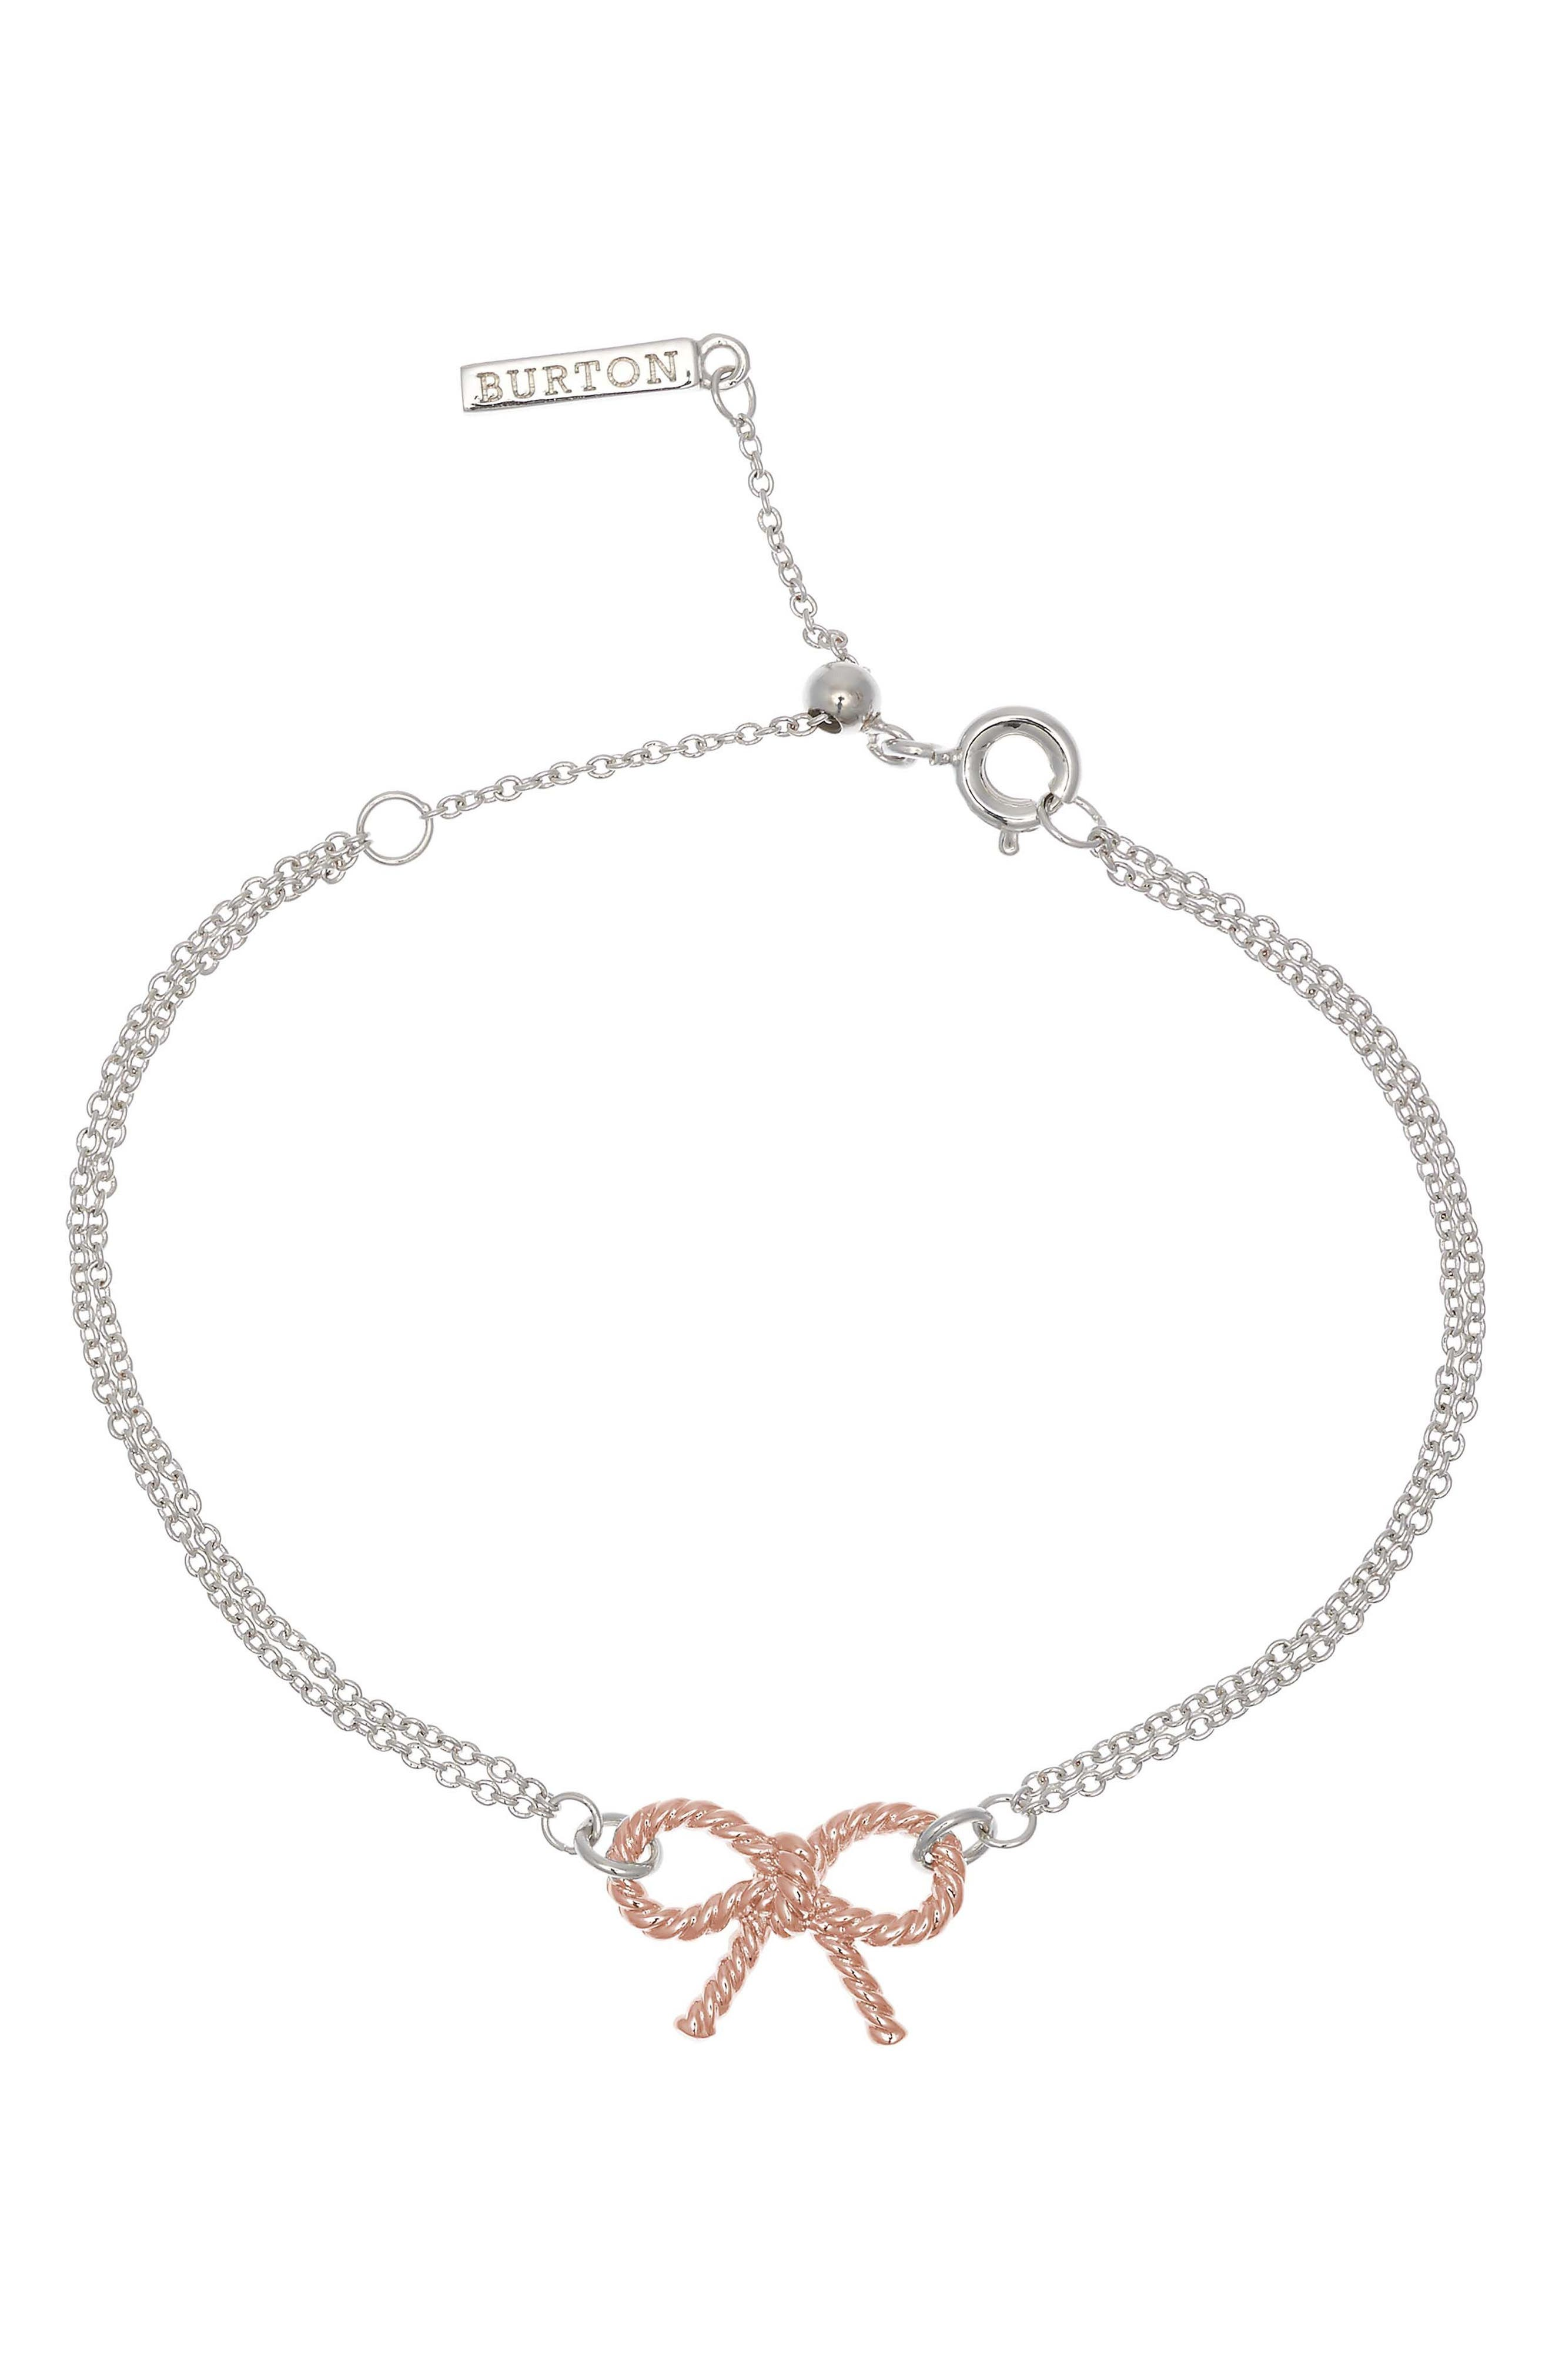 Vintage Bow Chain Bracelet,                             Main thumbnail 1, color,                             SILVER/ ROSE GOLD